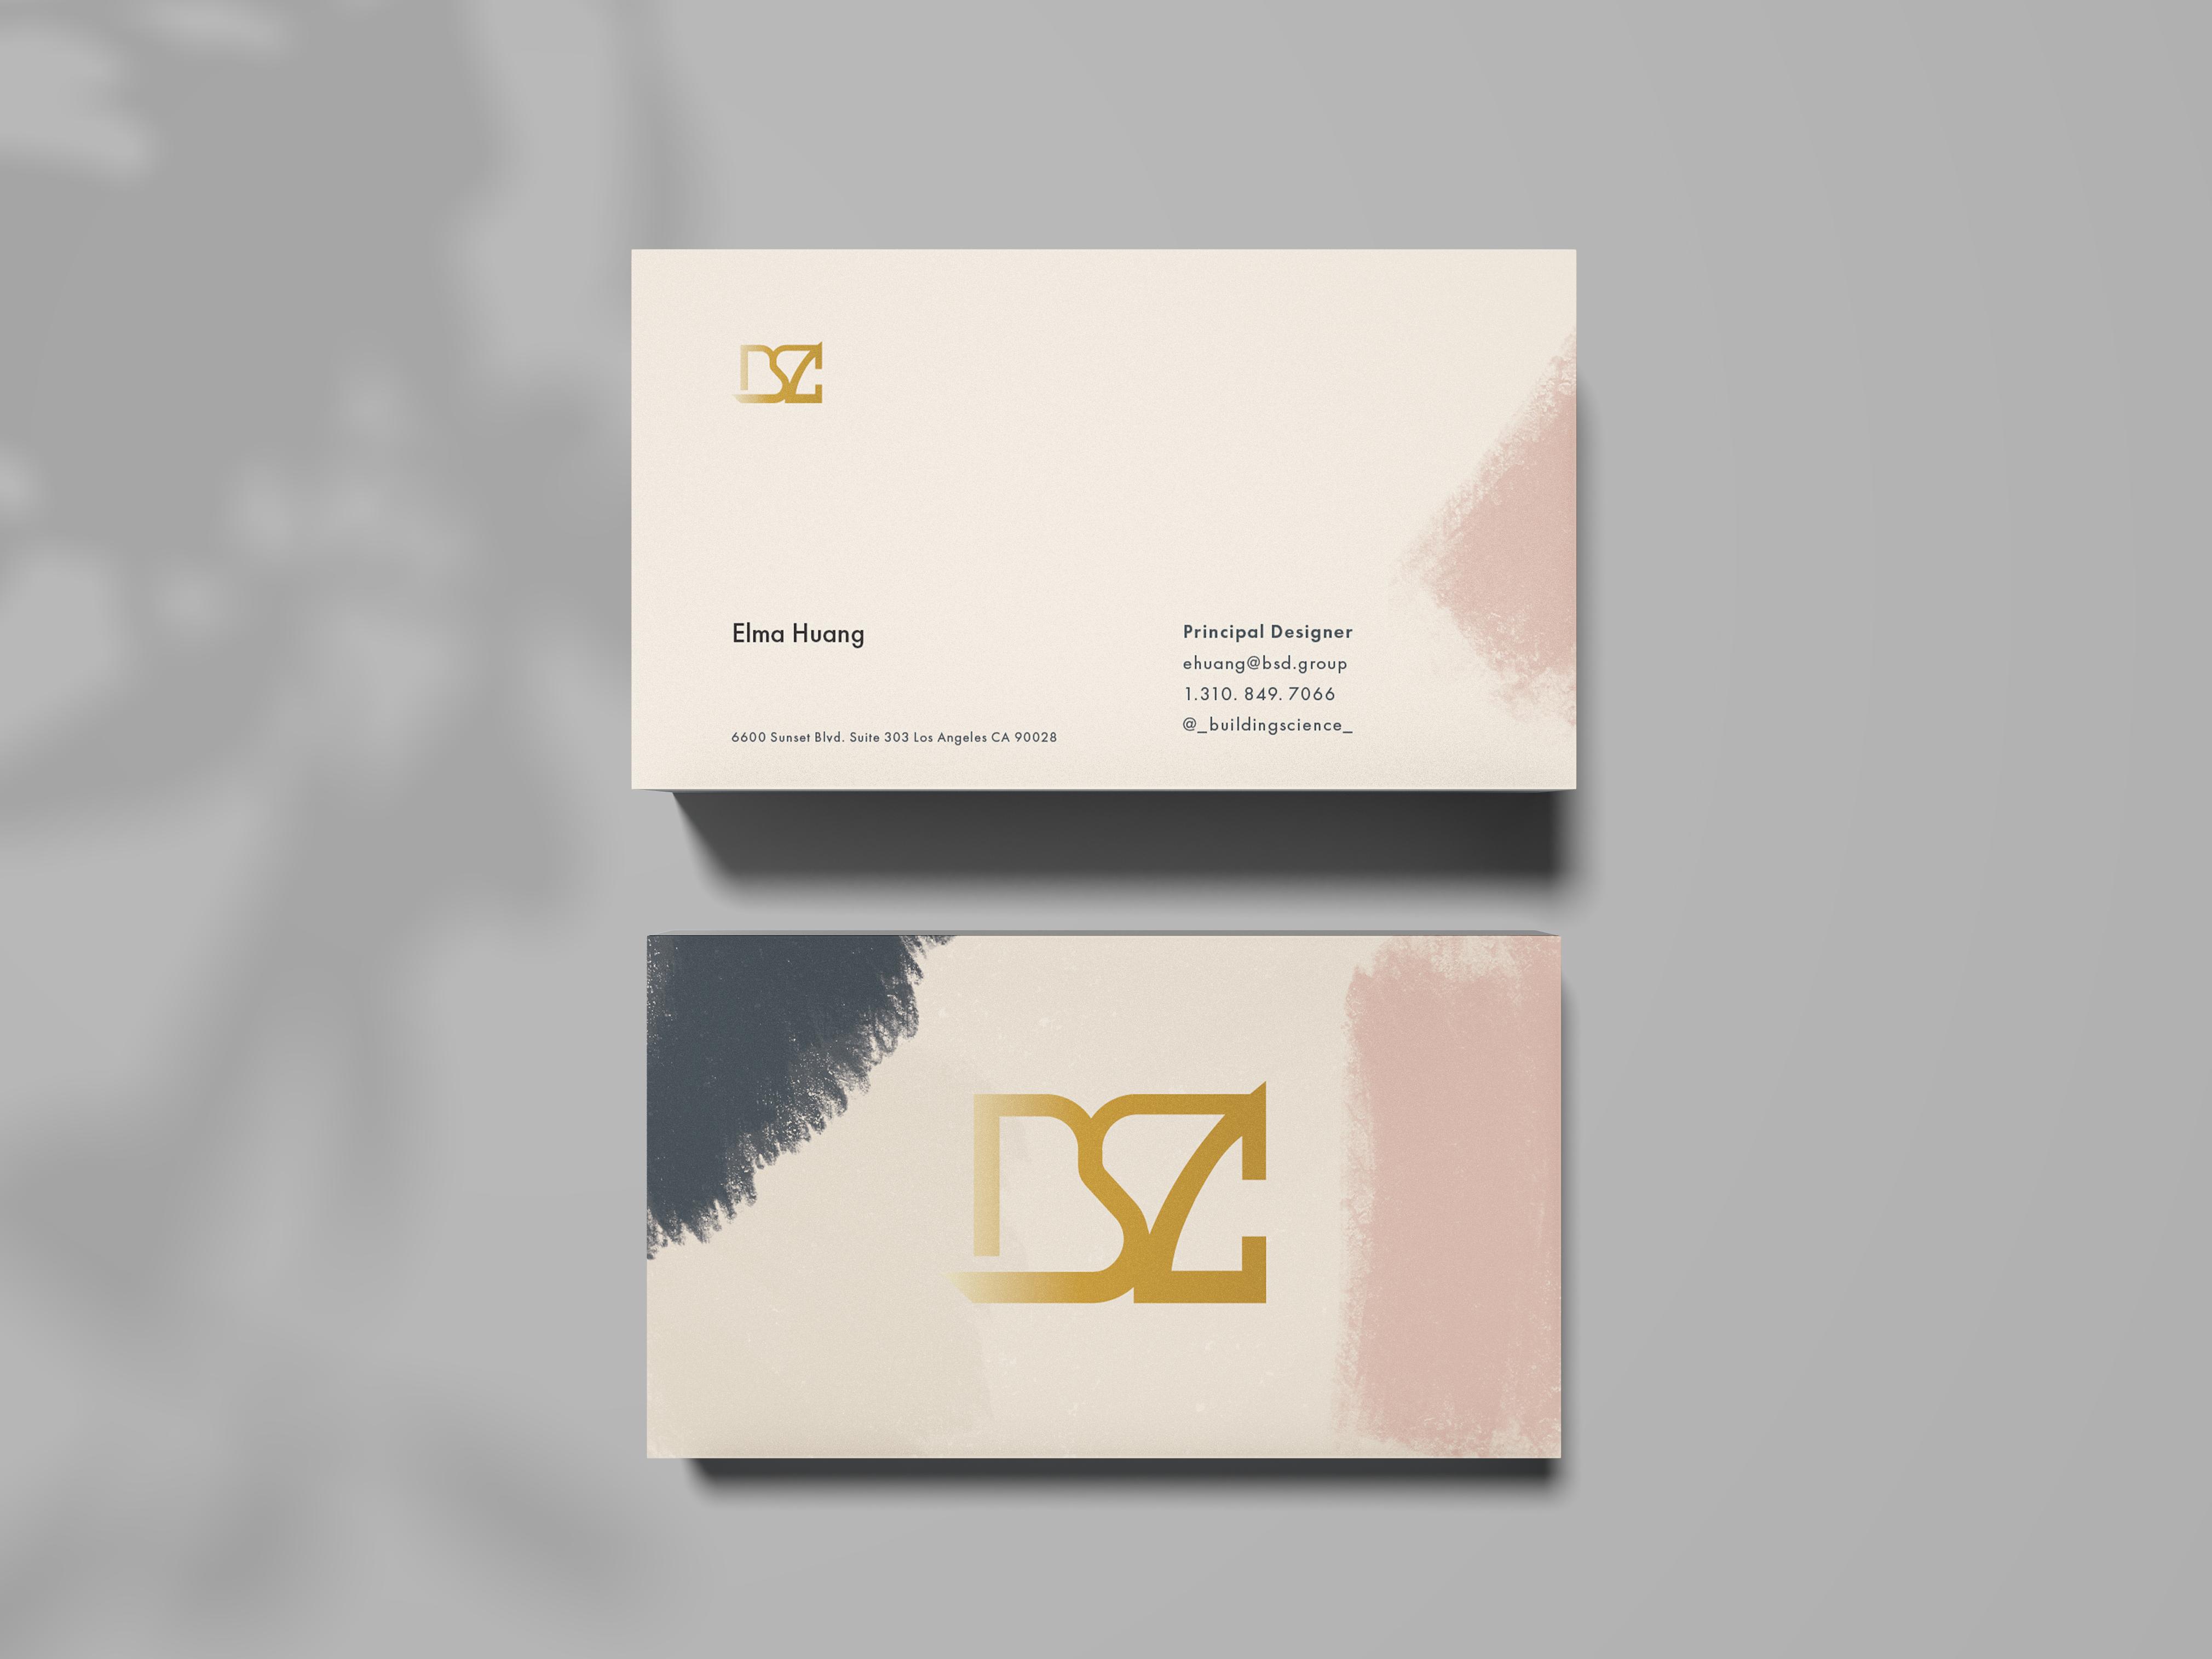 Business Card Design For Interior Designer Interior Designer Business Card Card Design Business Card Design